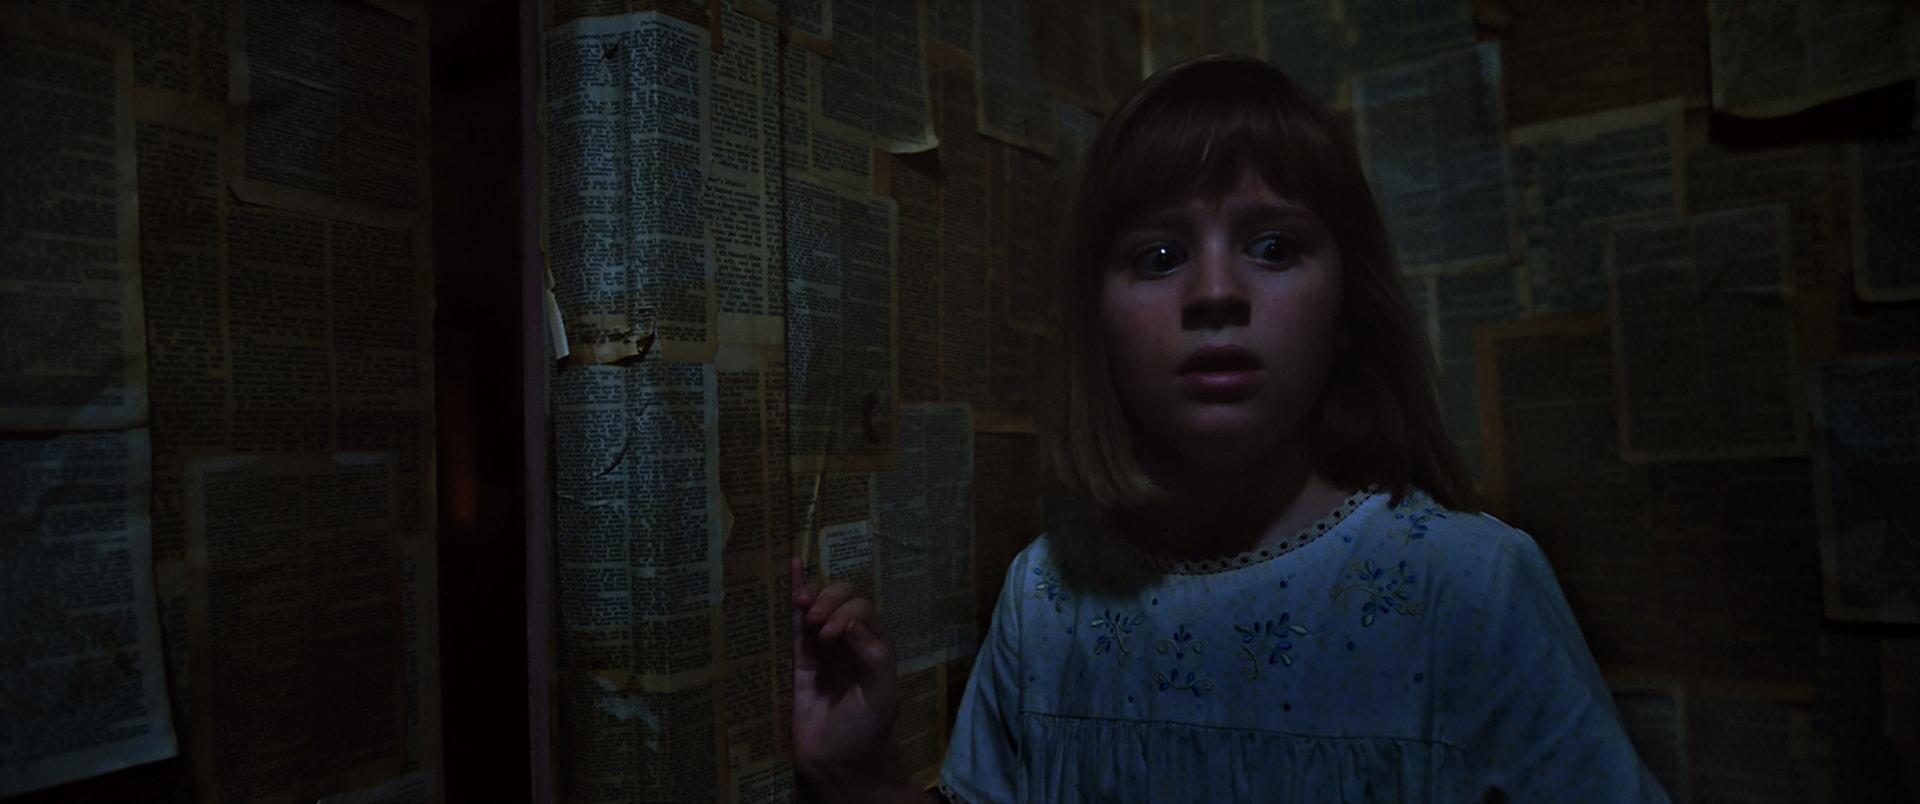 "LULU WILSON as Linda in New Line Cinema's supernatural thriller ""ANNABELLE: CREATION,"" a Warner Bros. Pictures release."